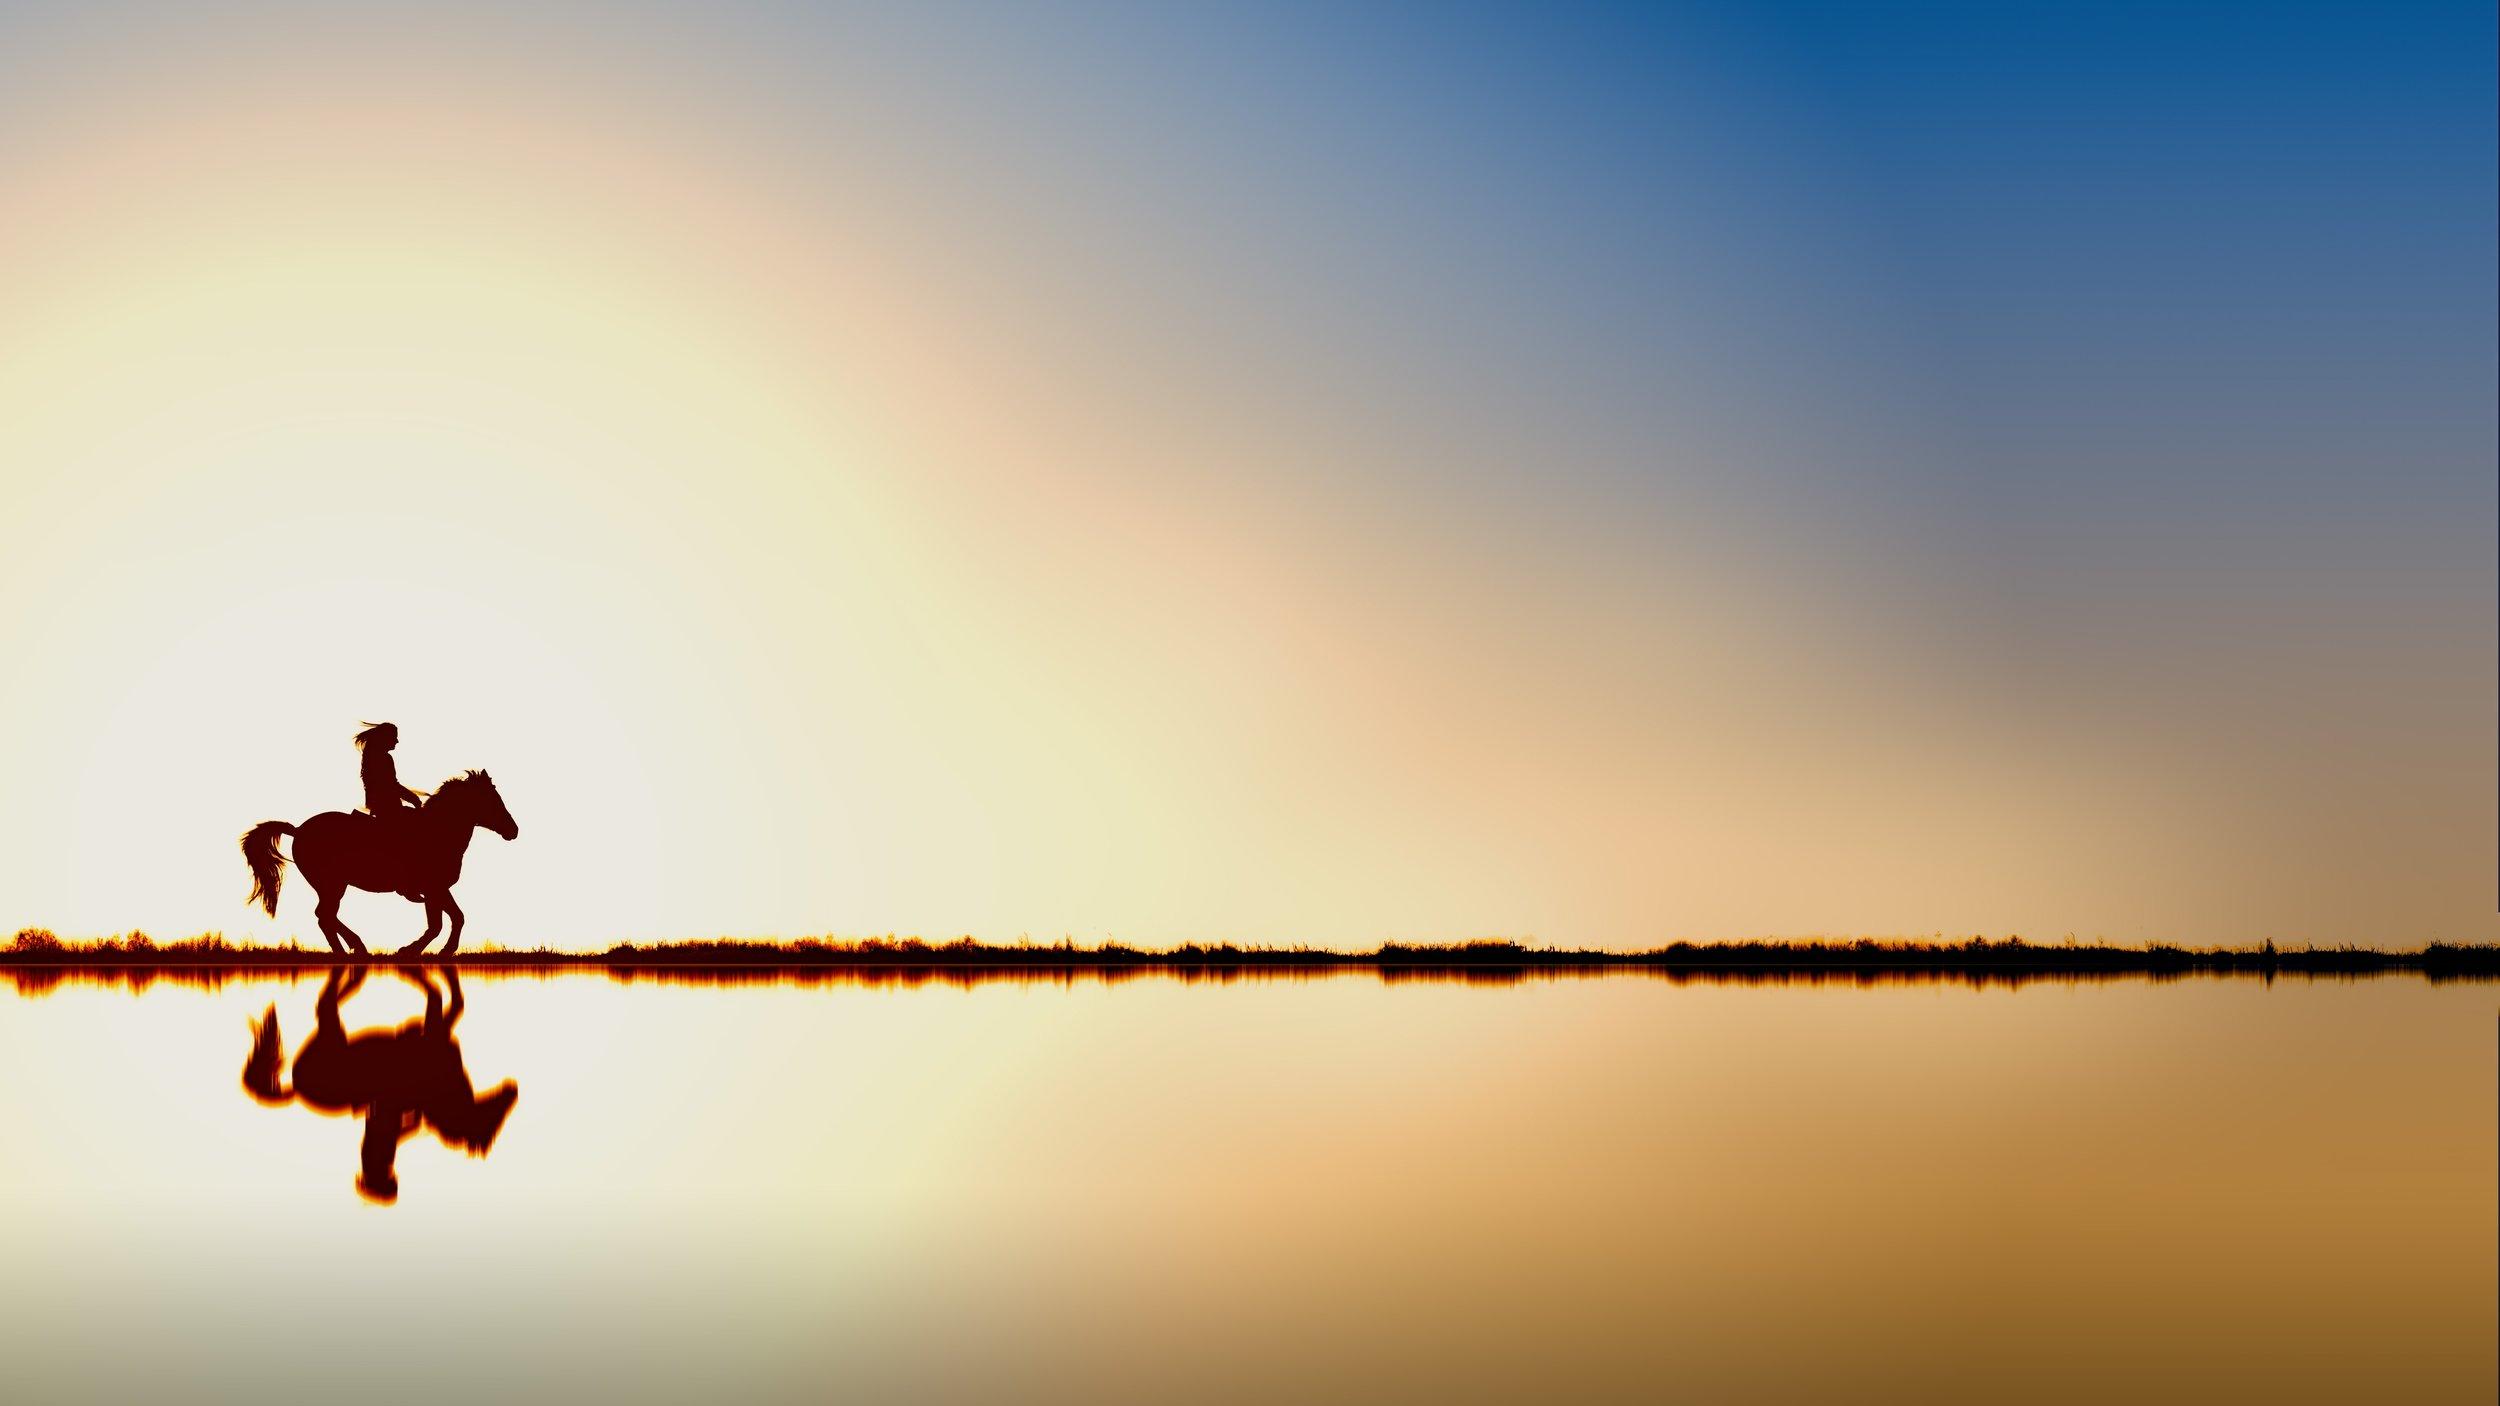 backlit-beach-blue-1125774.jpg